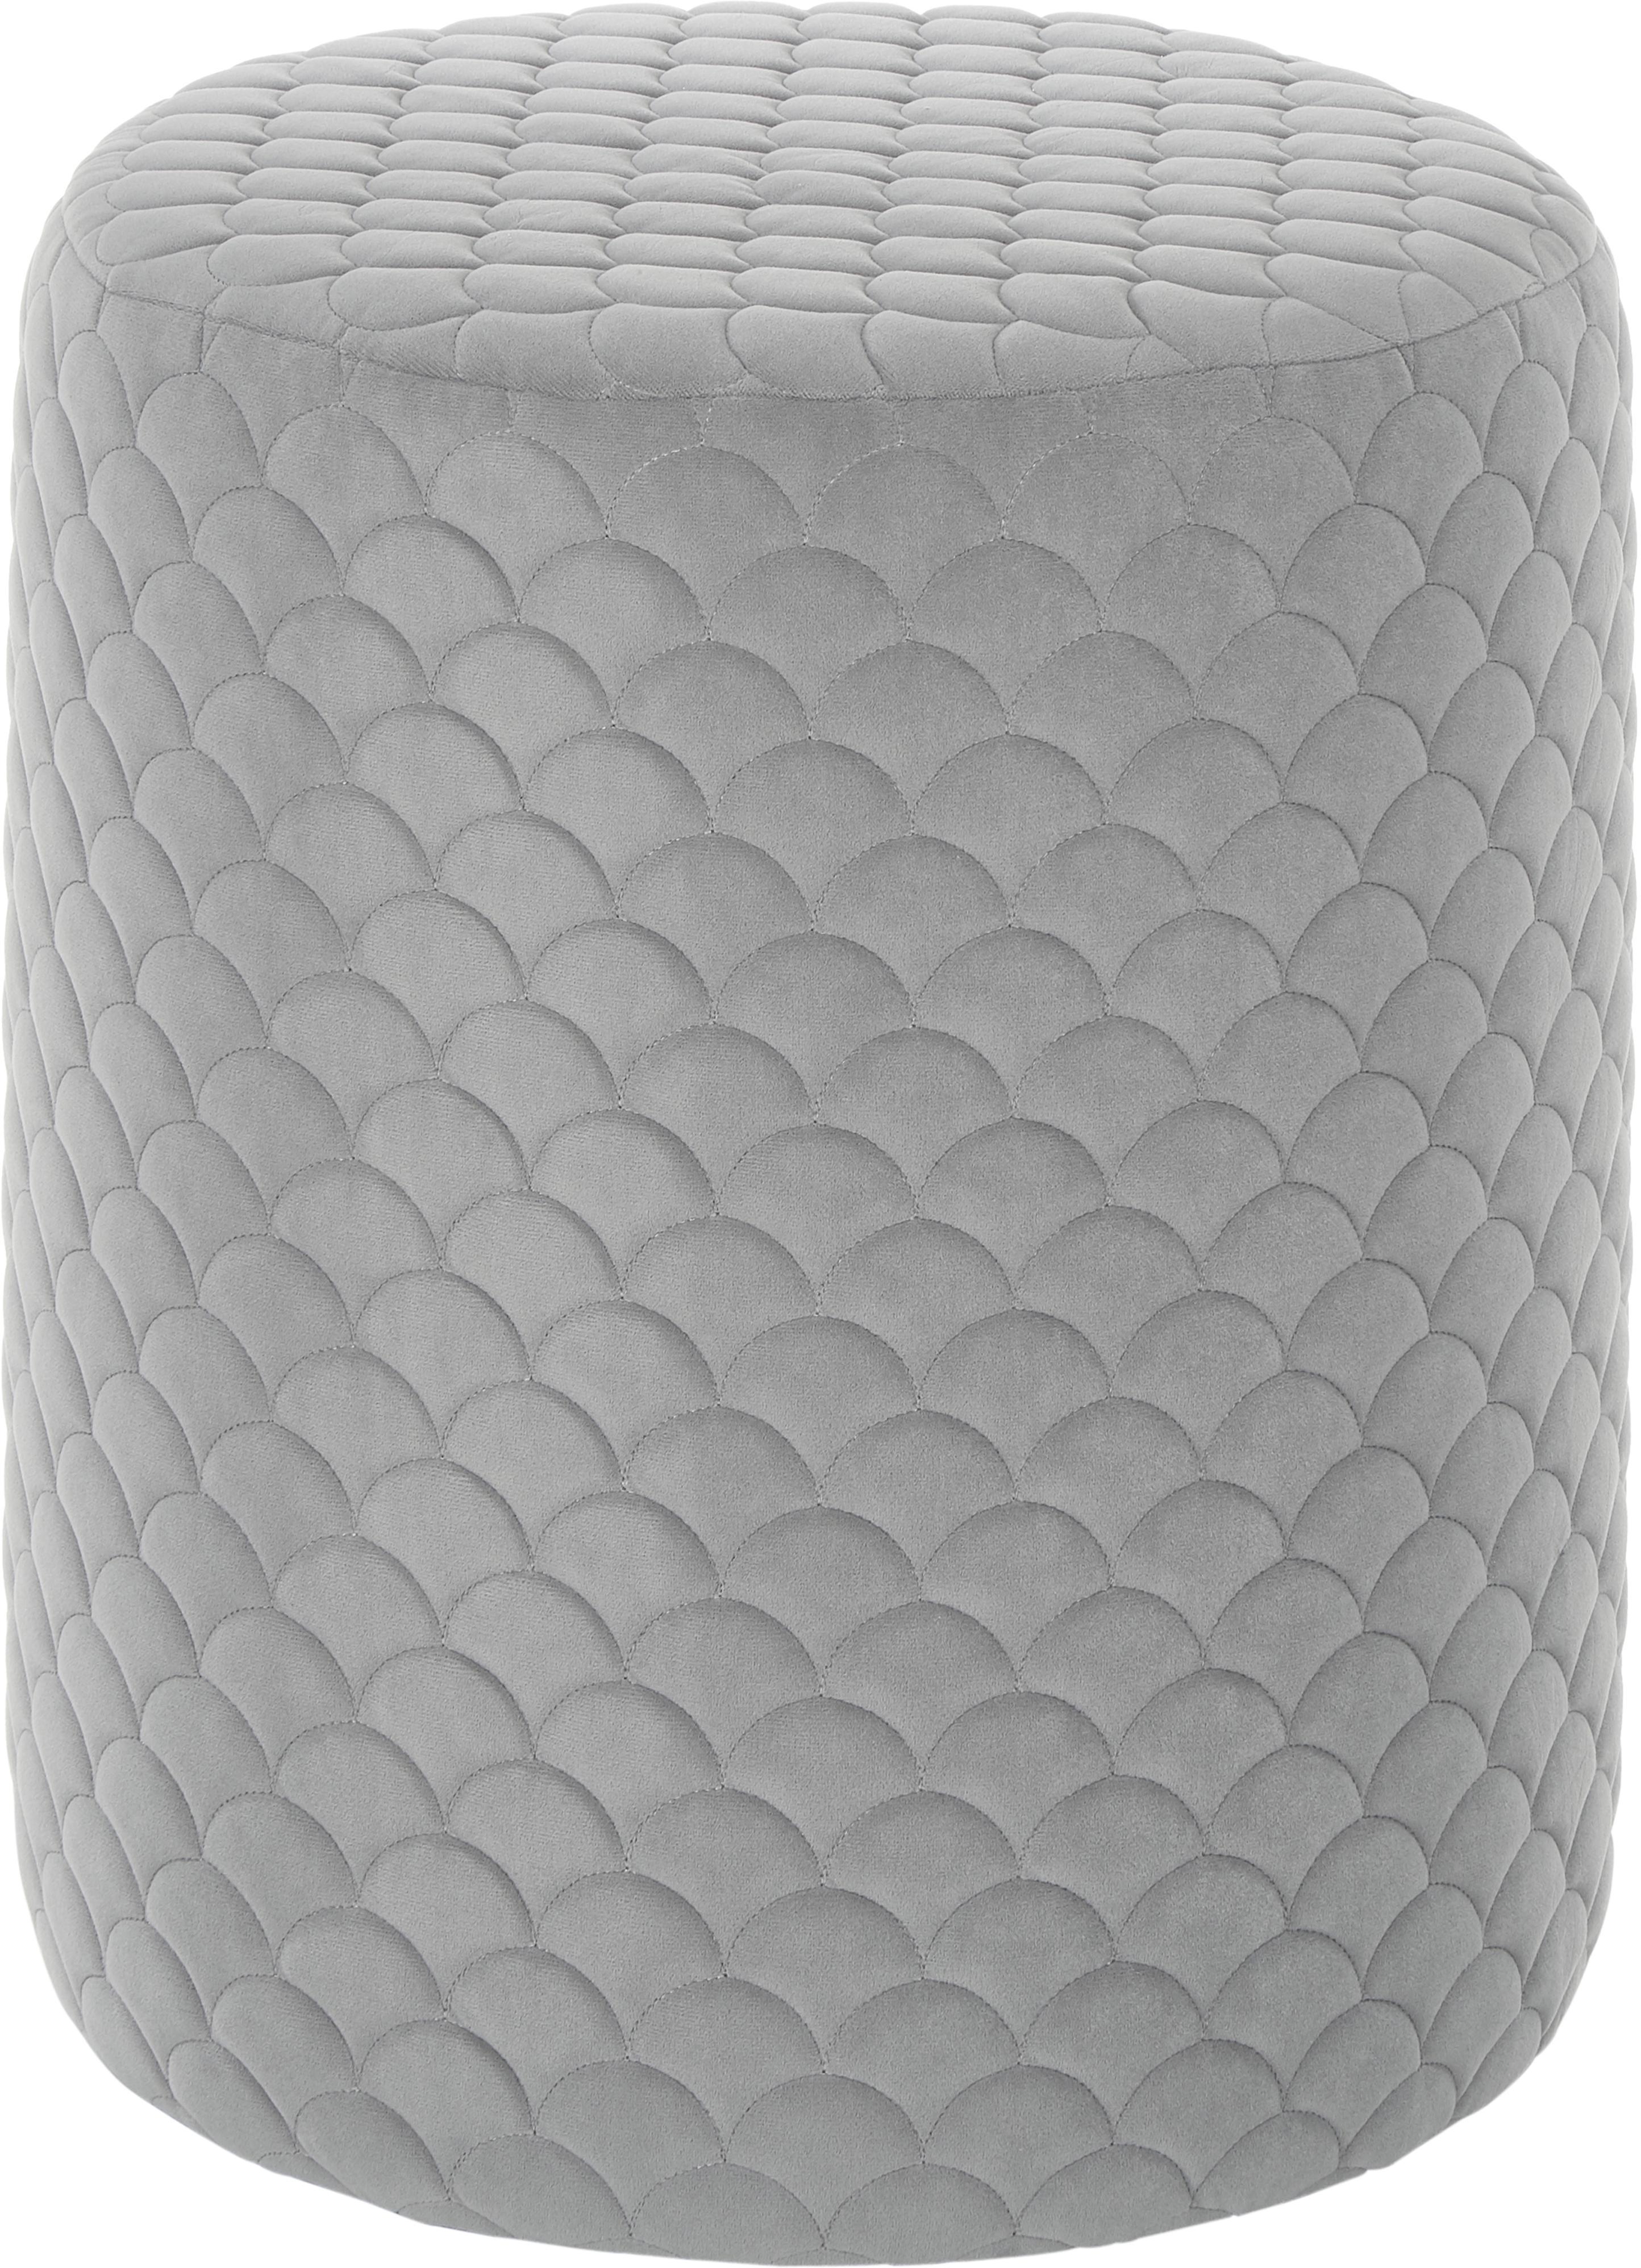 Samt-Hocker Daisy, Bezug: Samt (Polyester) 84.000 S, Rahmen: Sperrholz, Samt Grau, Ø 38 x H 45 cm